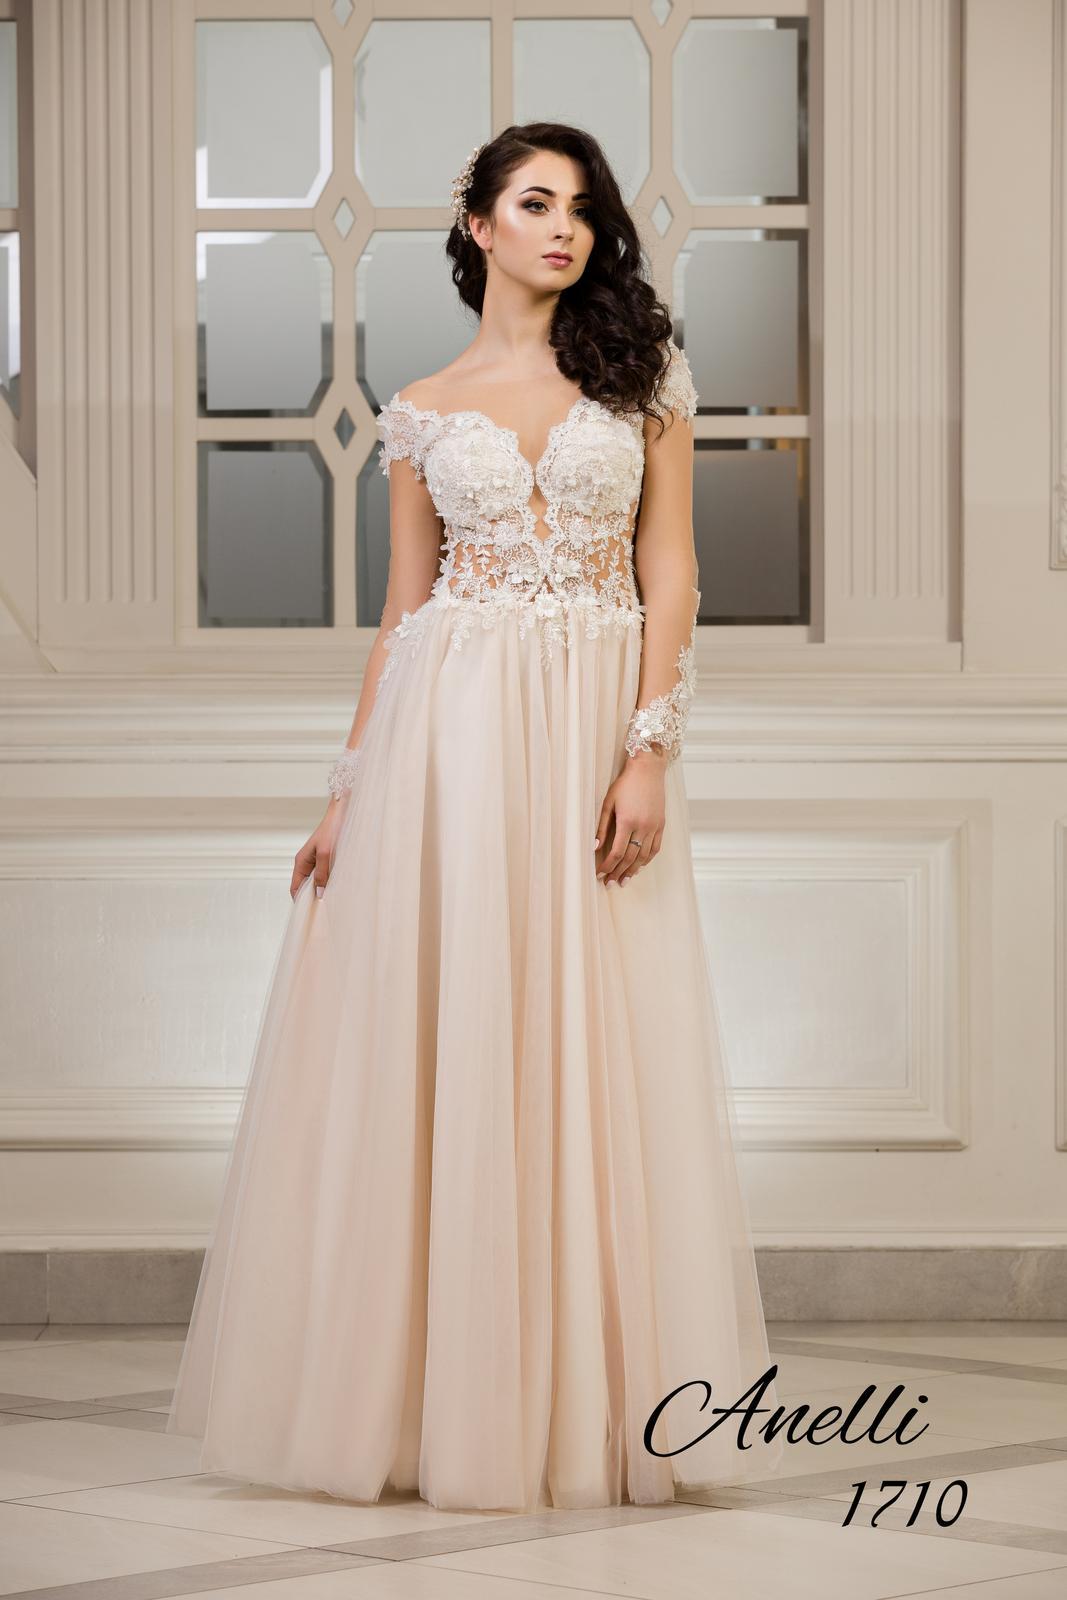 Svadobné šaty - Debut 1710 - Obrázok č. 1